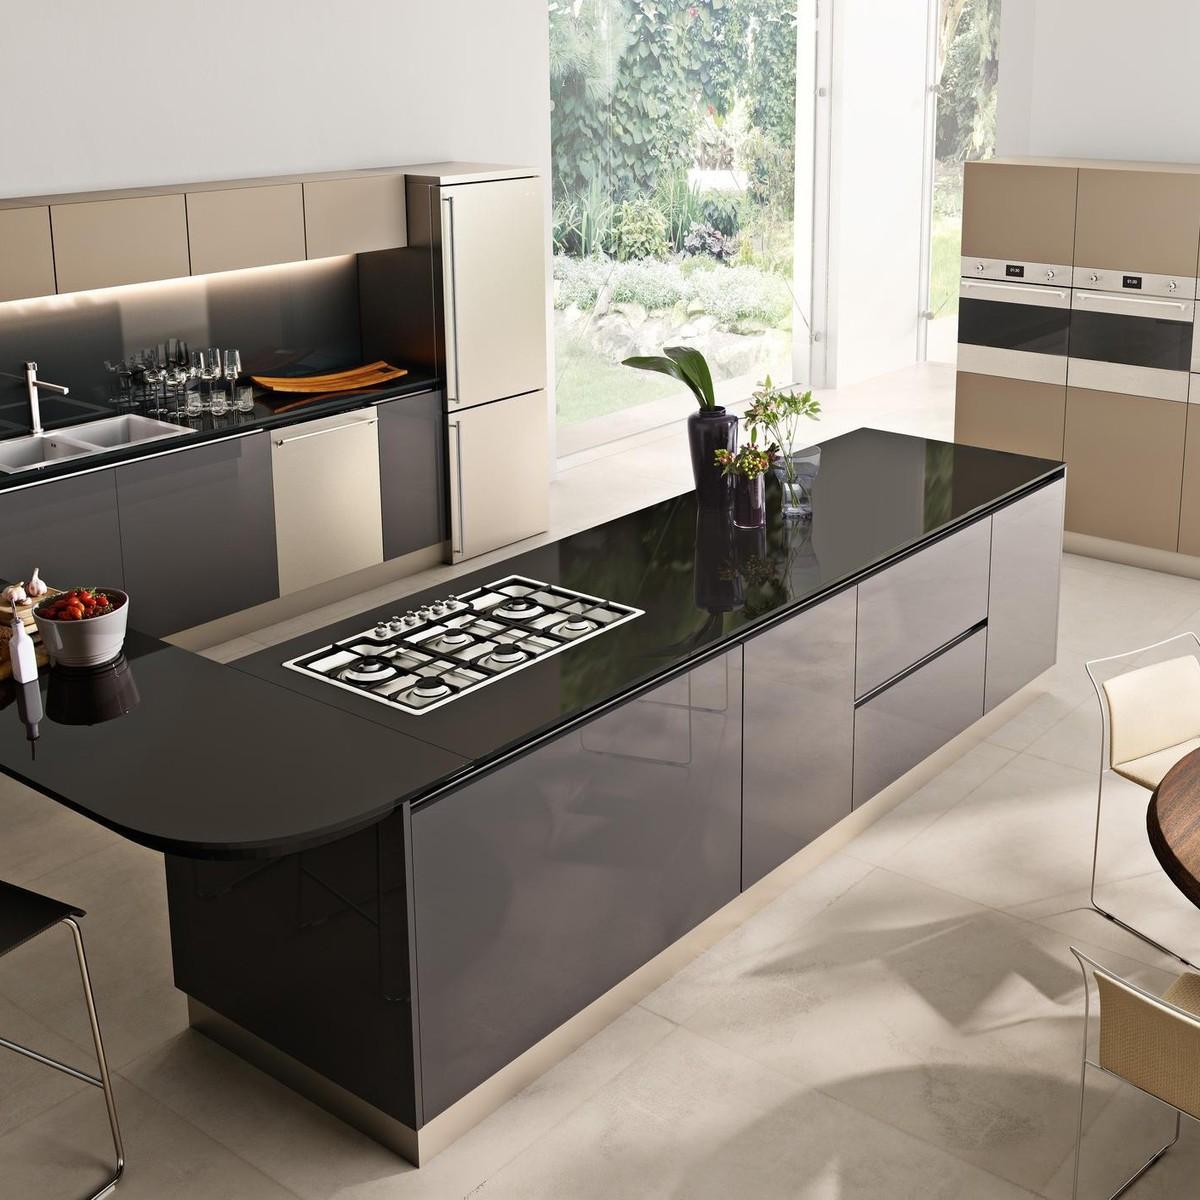 sta13xl 2 lave vaisselle int grable smeg. Black Bedroom Furniture Sets. Home Design Ideas